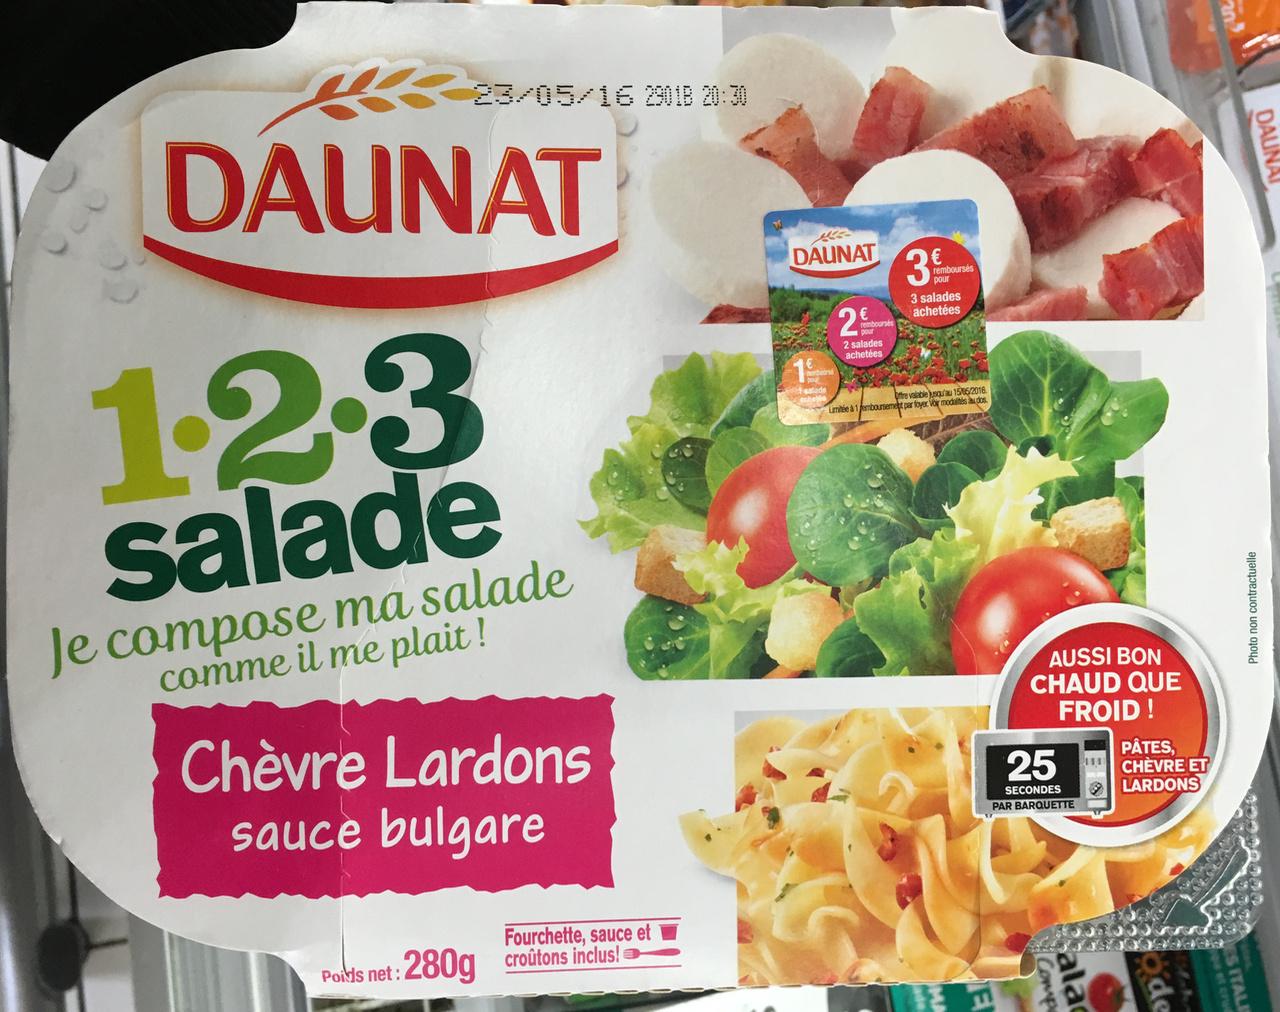 1-2-3 Salade Chèvre Lardons sauce bulgare - Produit